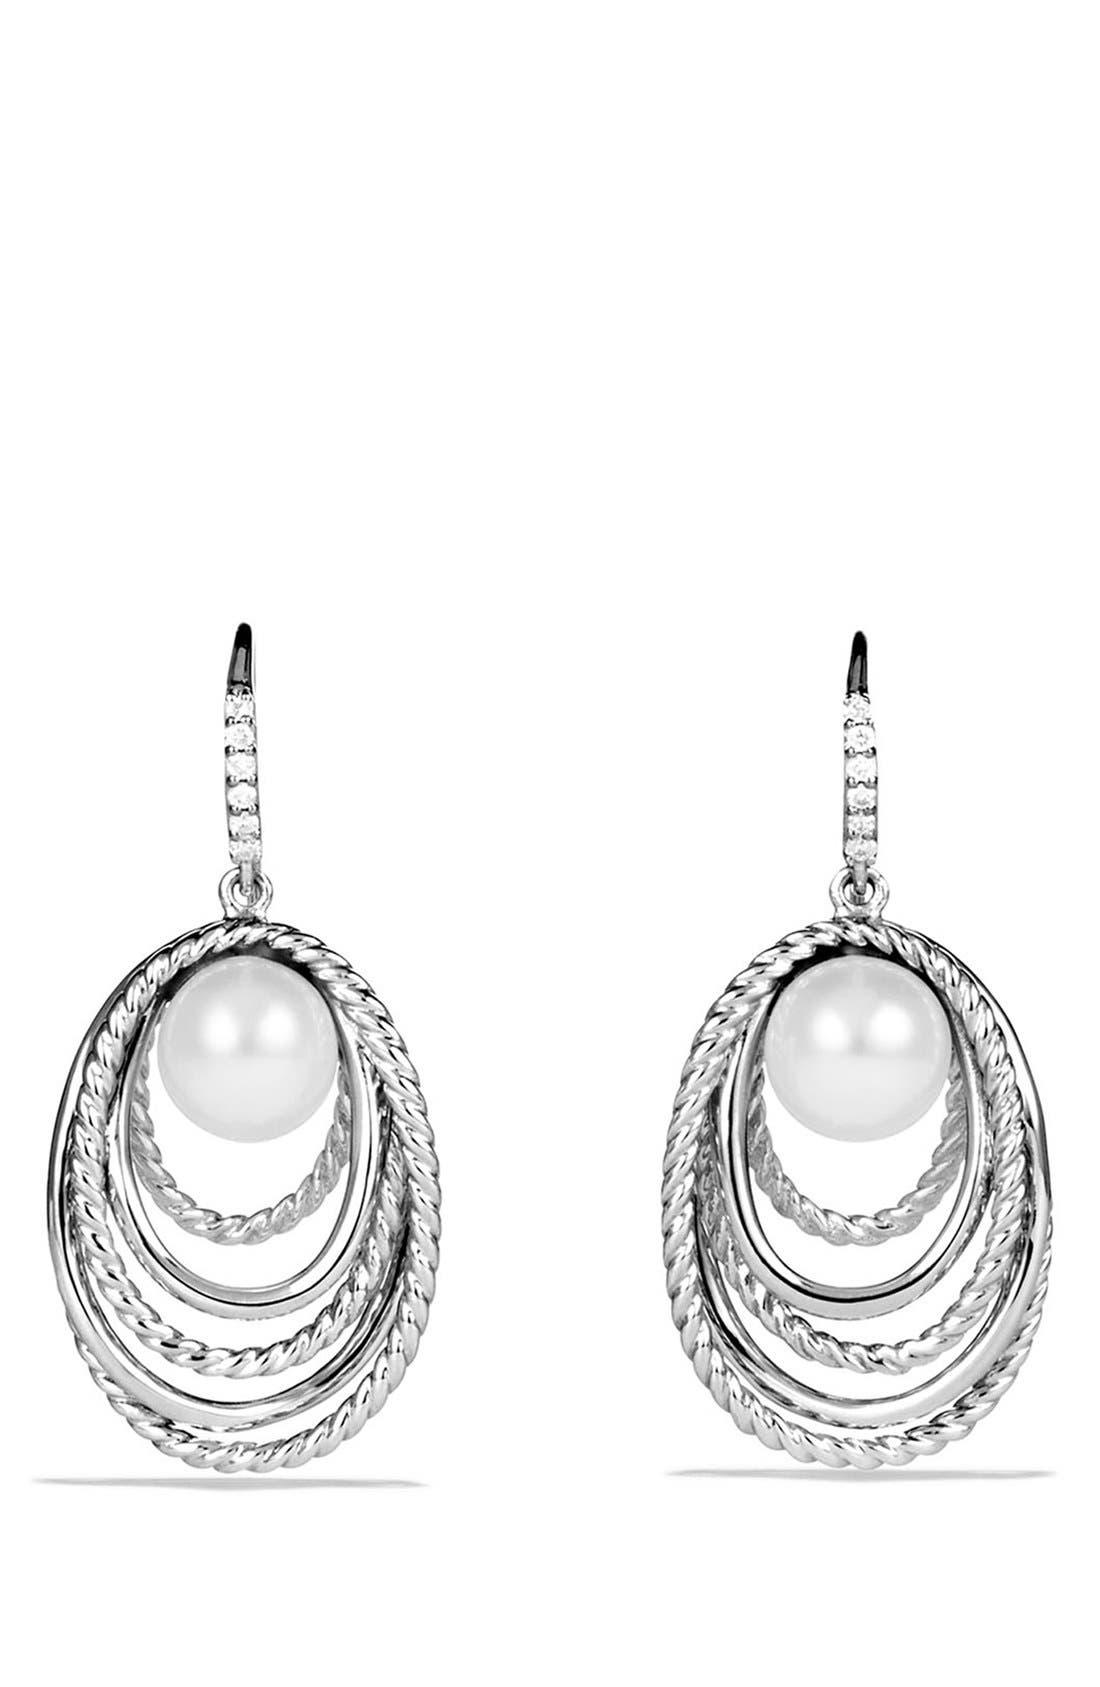 Alternate Image 1 Selected - David Yurman 'Crossover' Pearl Drop Earrings with Diamonds